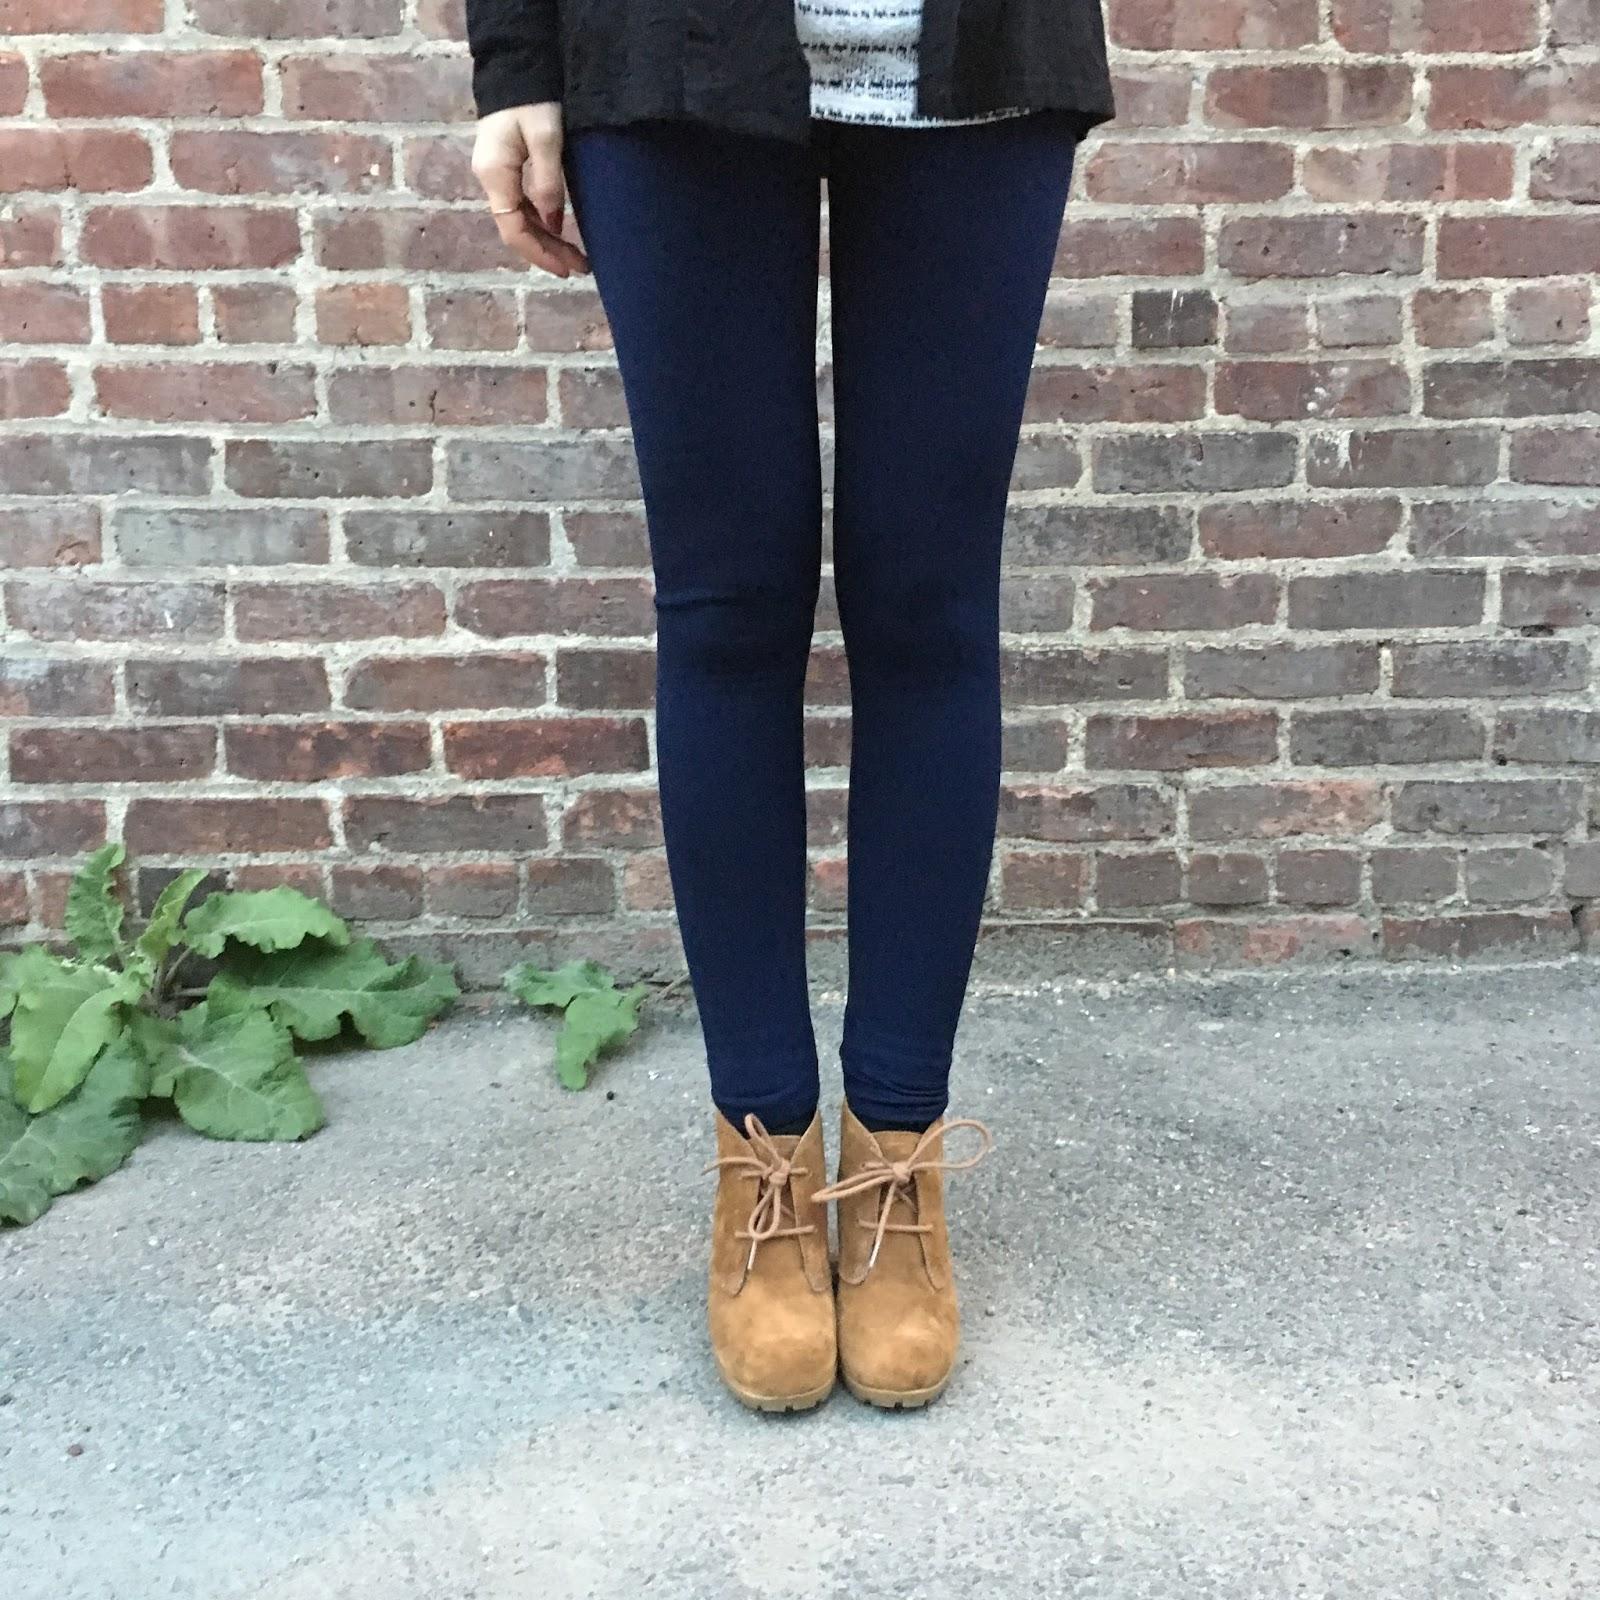 dawgs-cardigans-leggings